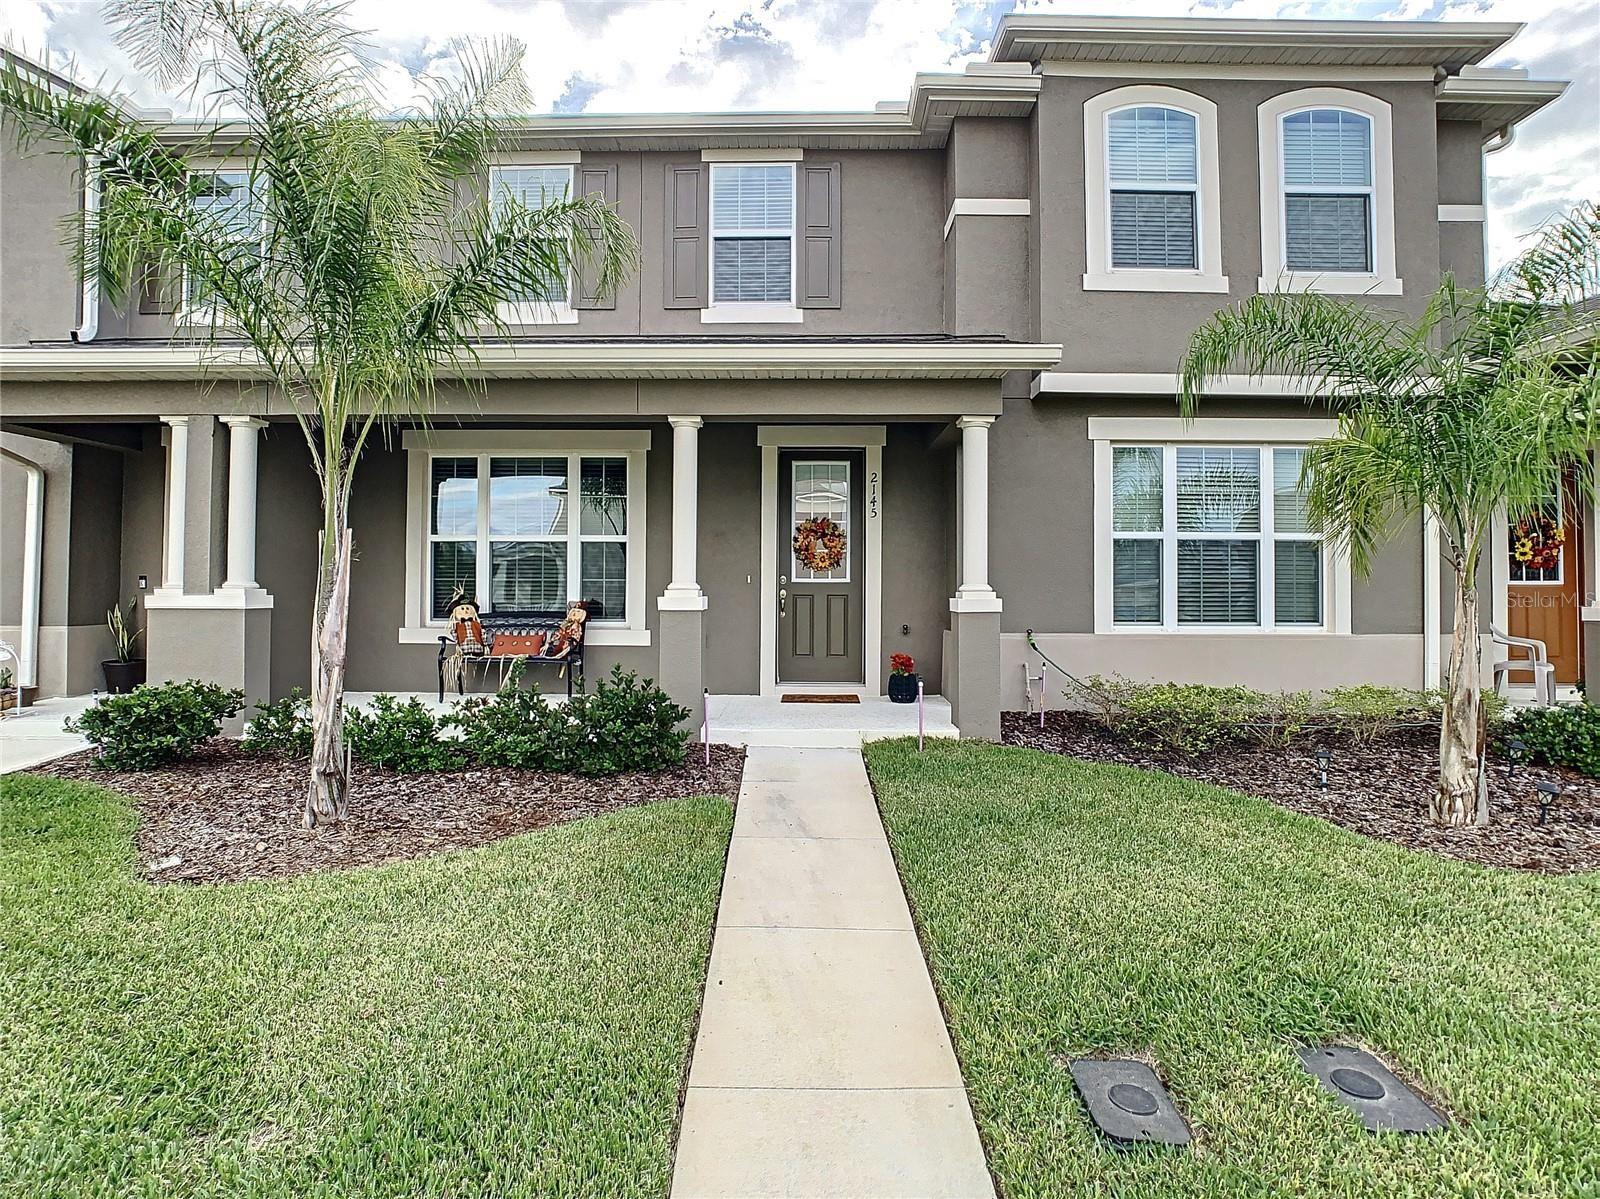 Photo of 2145 VALENCIA BLOSSOM ST., CLERMONT, FL 34711 (MLS # S5056862)